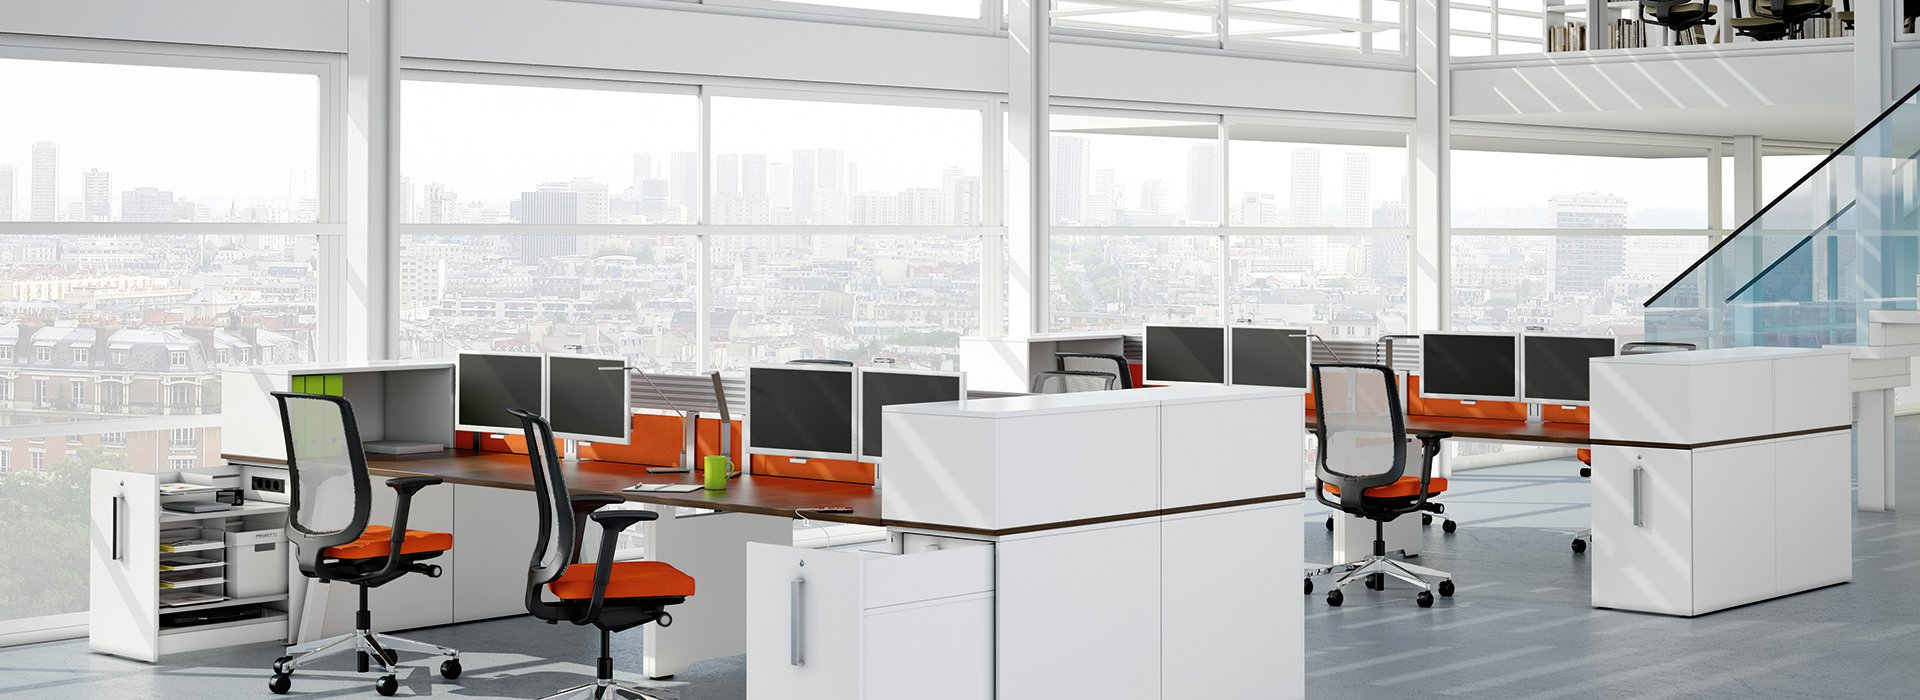 Bürogestaltung - Inspiration & Innovation - S+W BüroRaumKultur GmbH